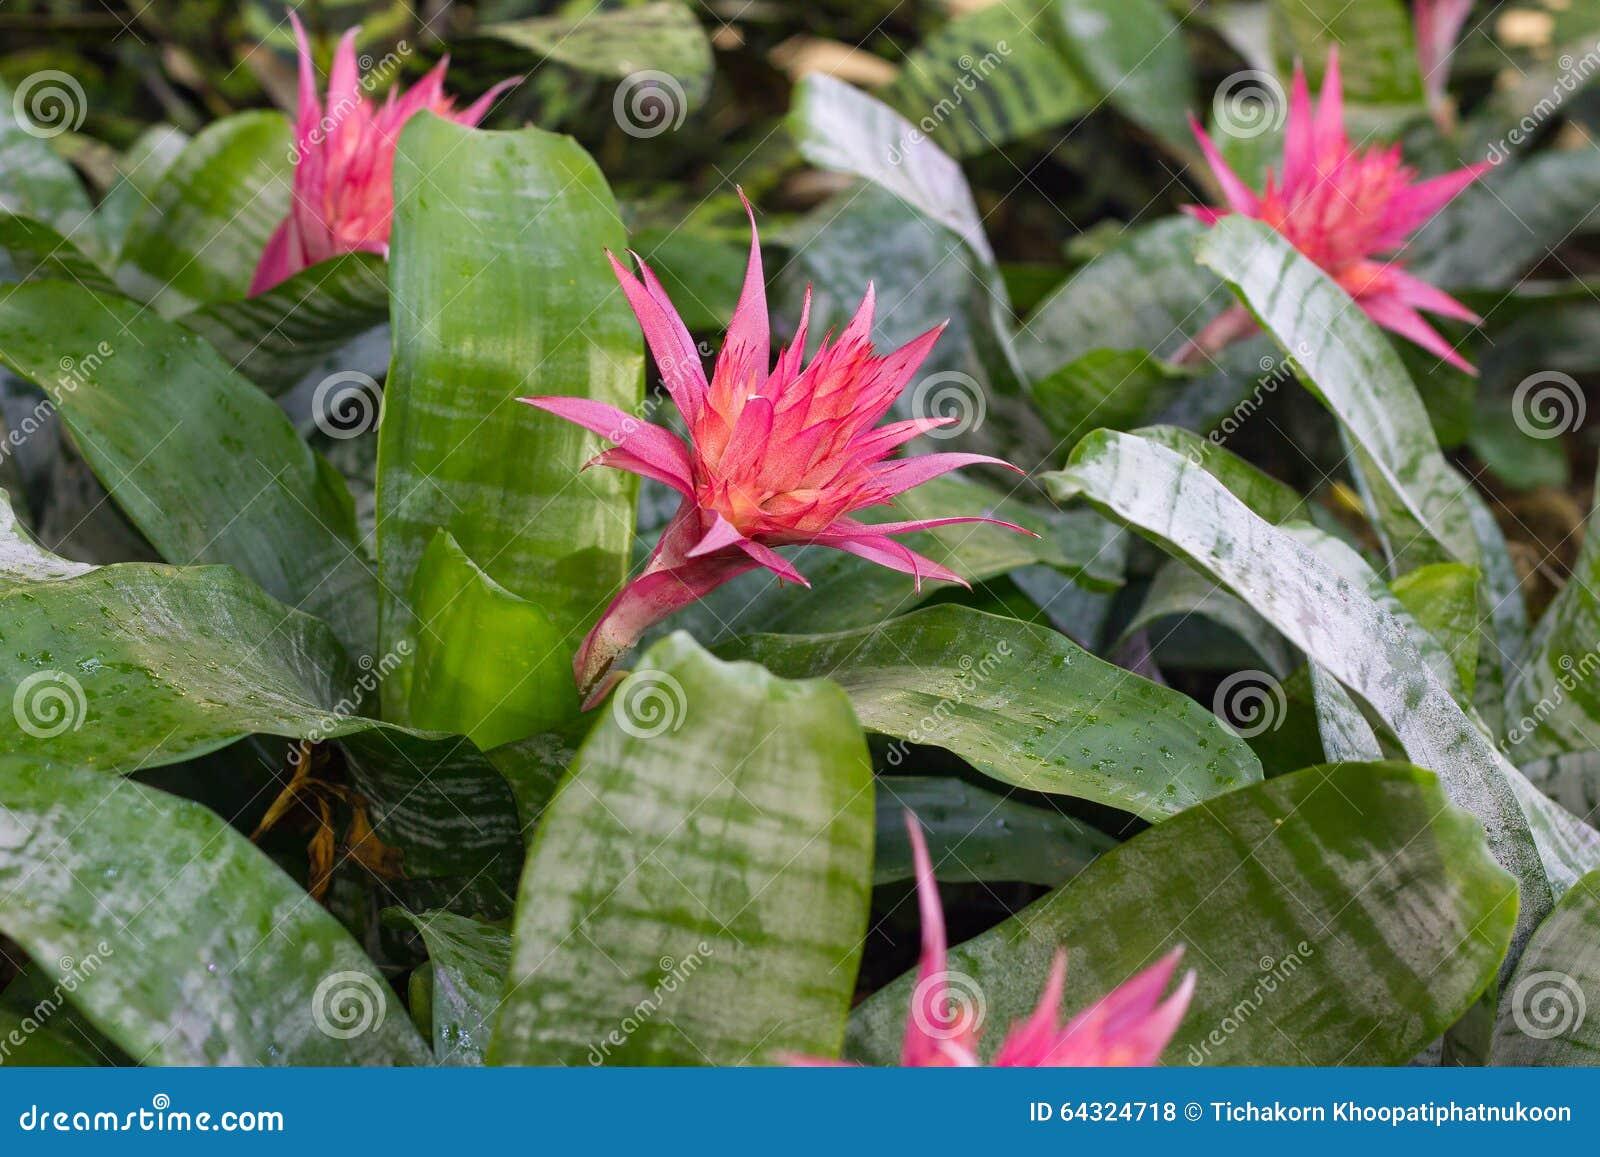 Bromeliad Flower In Bloom In Springtime Stock Photo Image Of Green